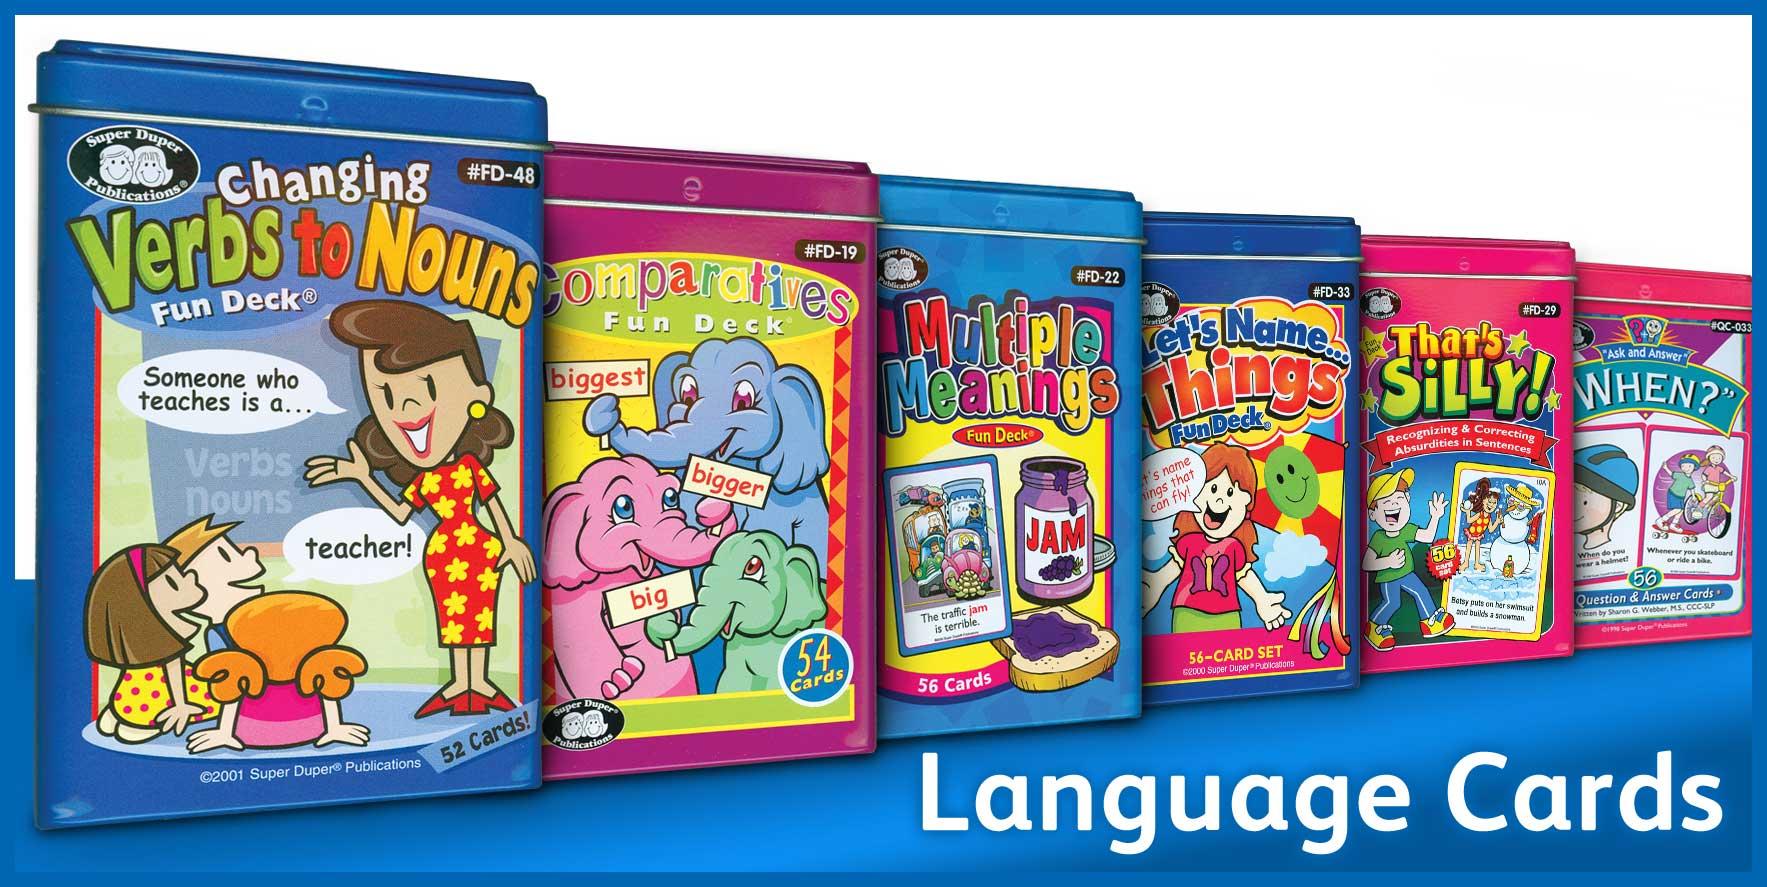 Shop for Language Cards